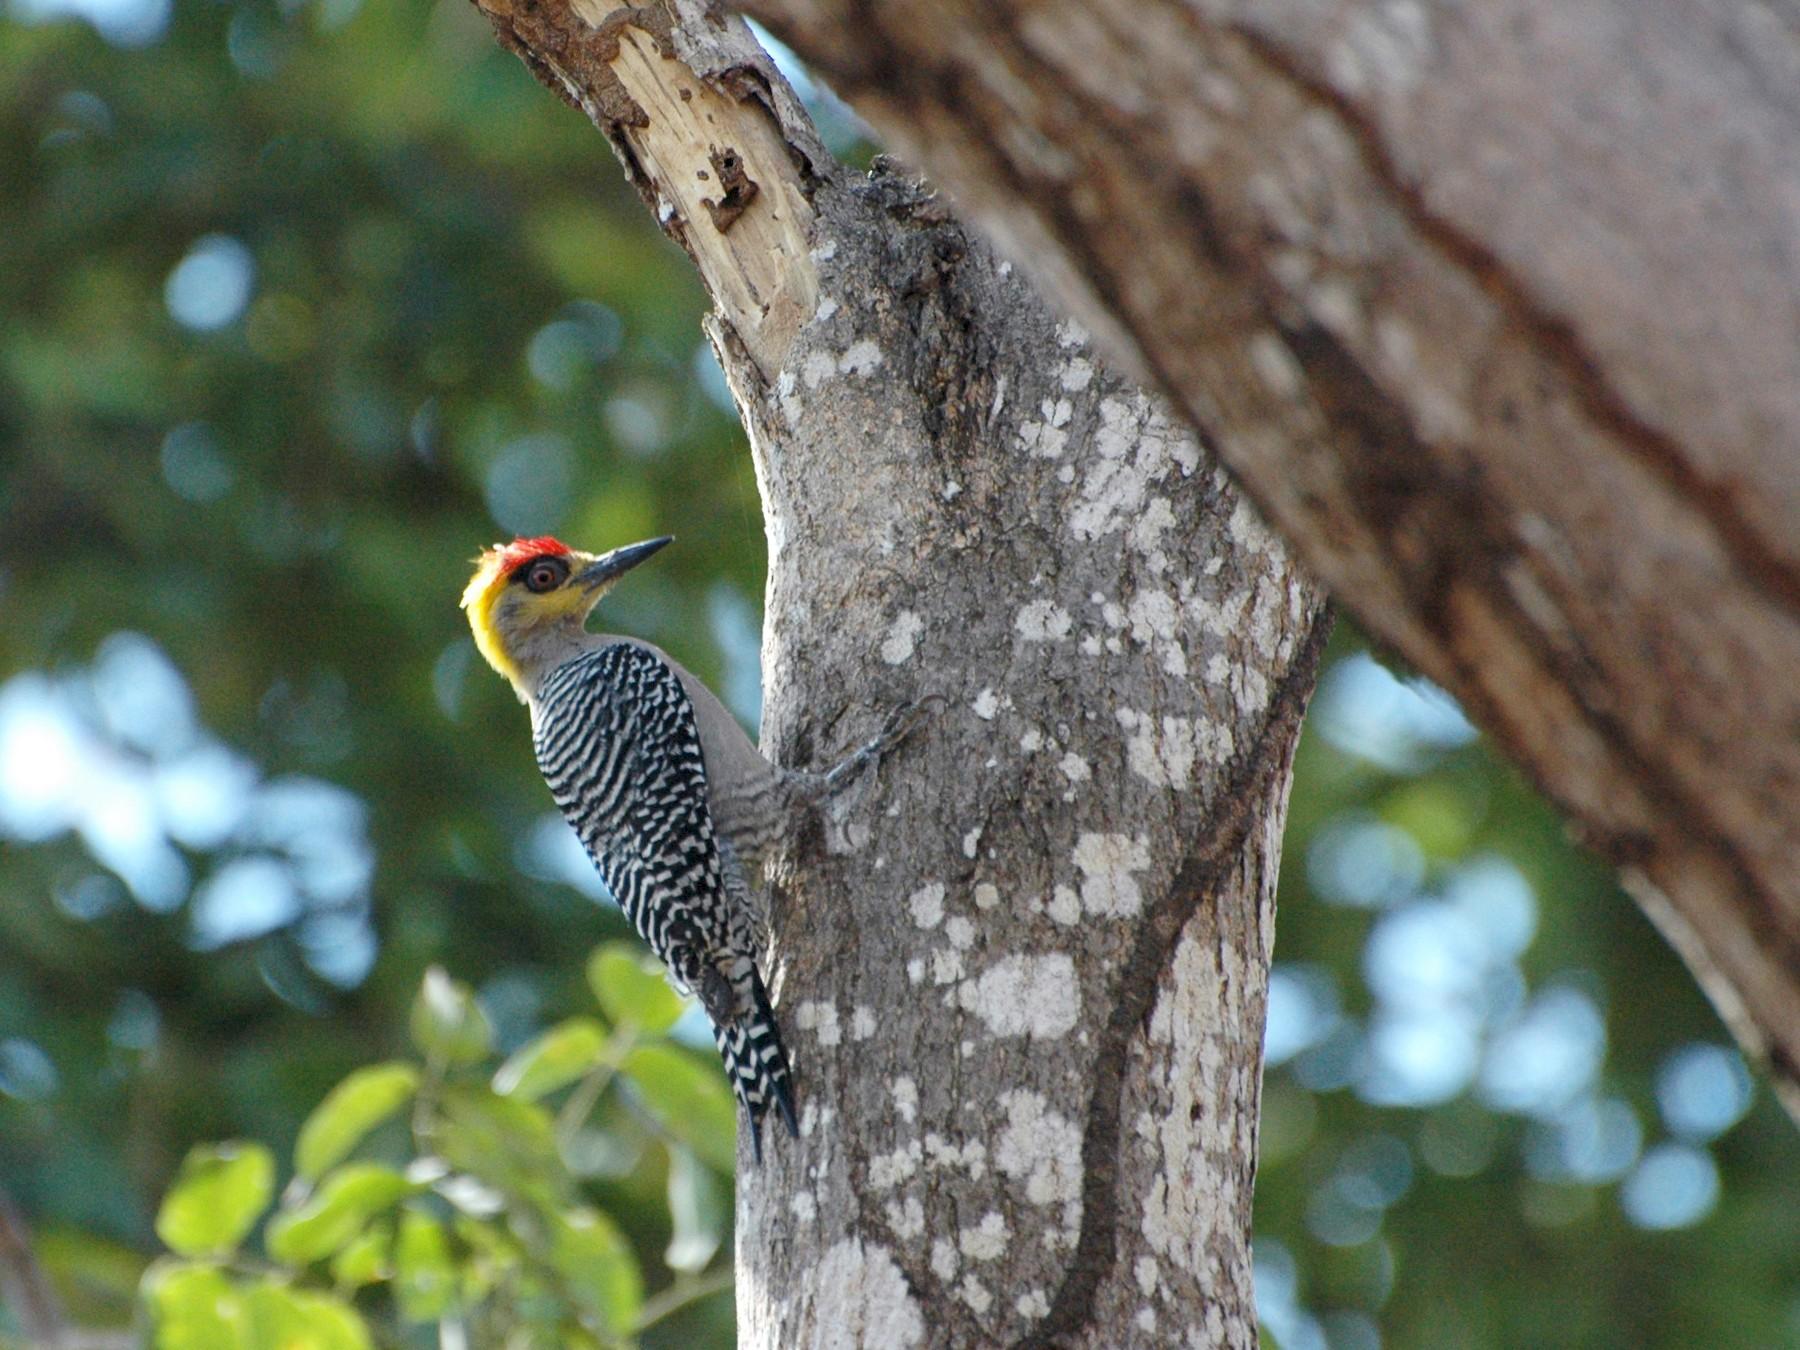 Golden-cheeked Woodpecker - Philippe Bigué